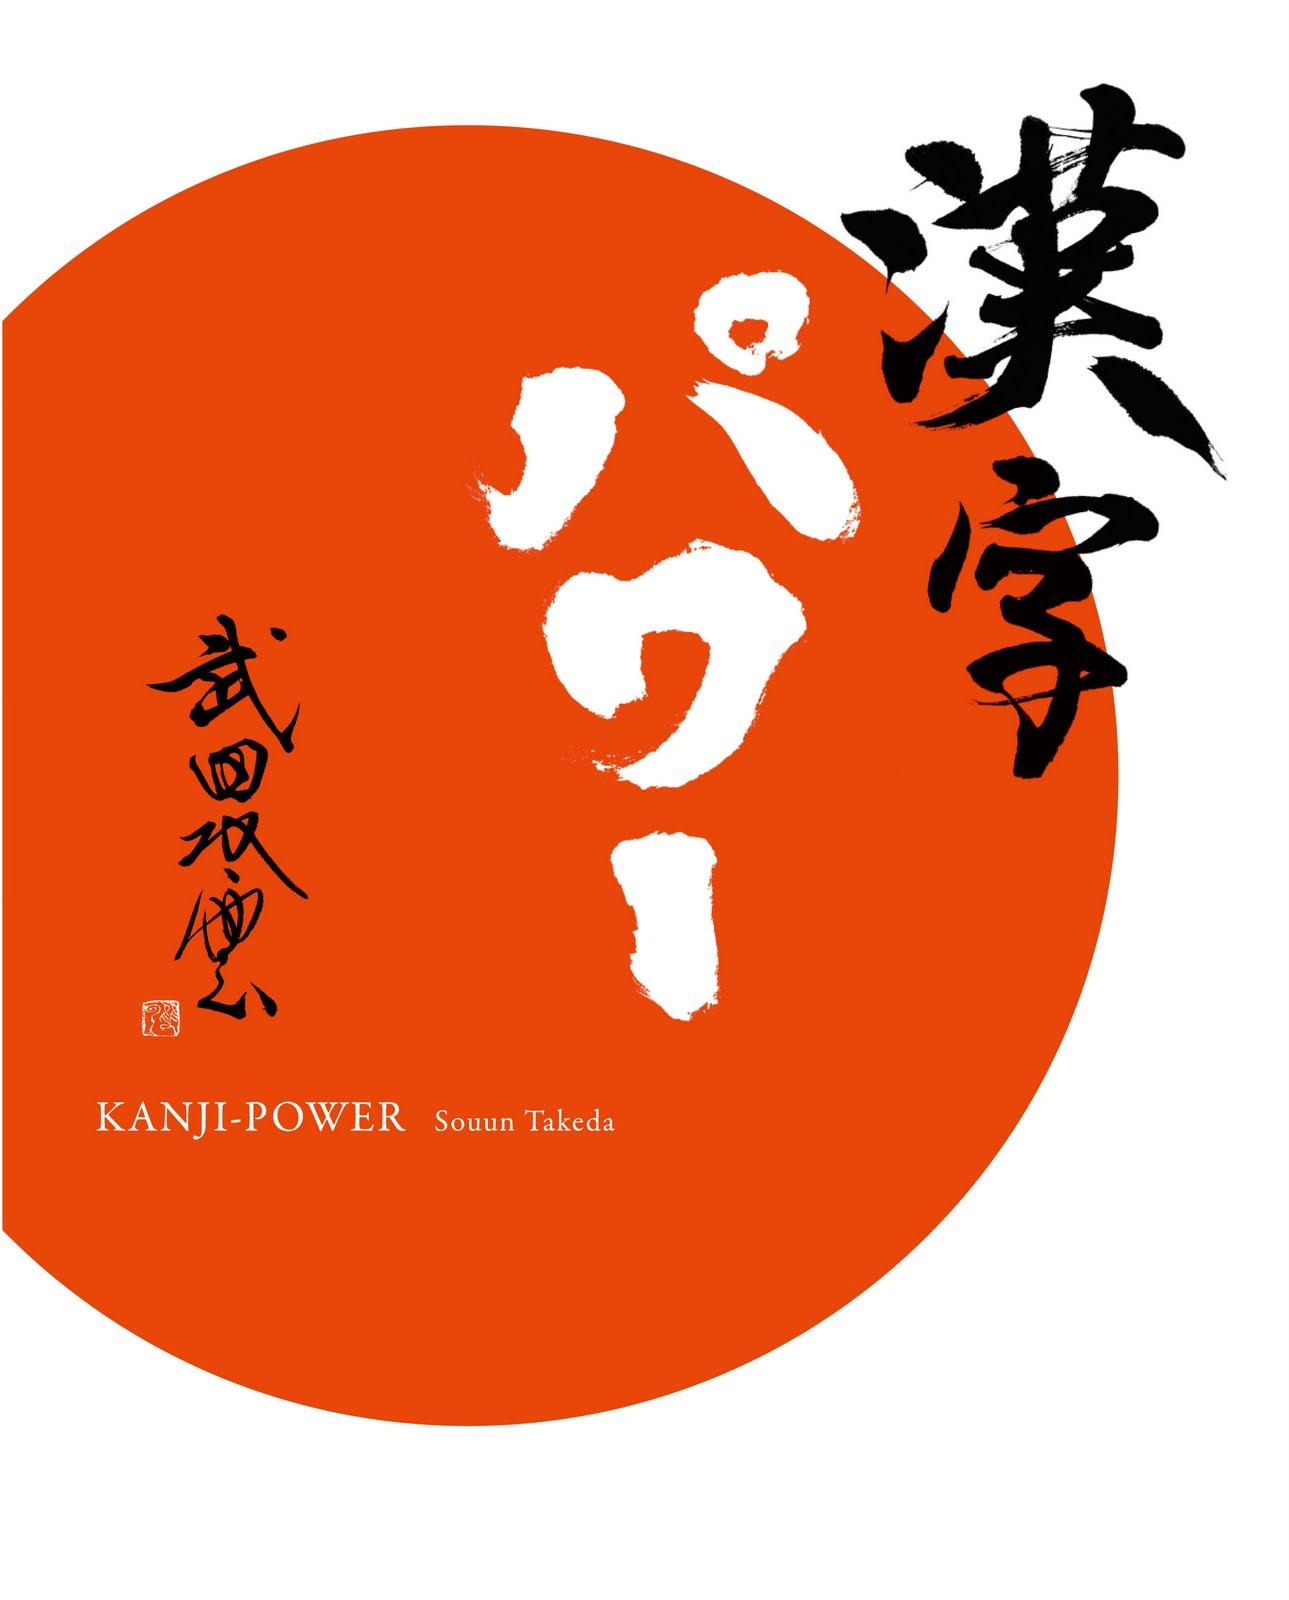 kanji power